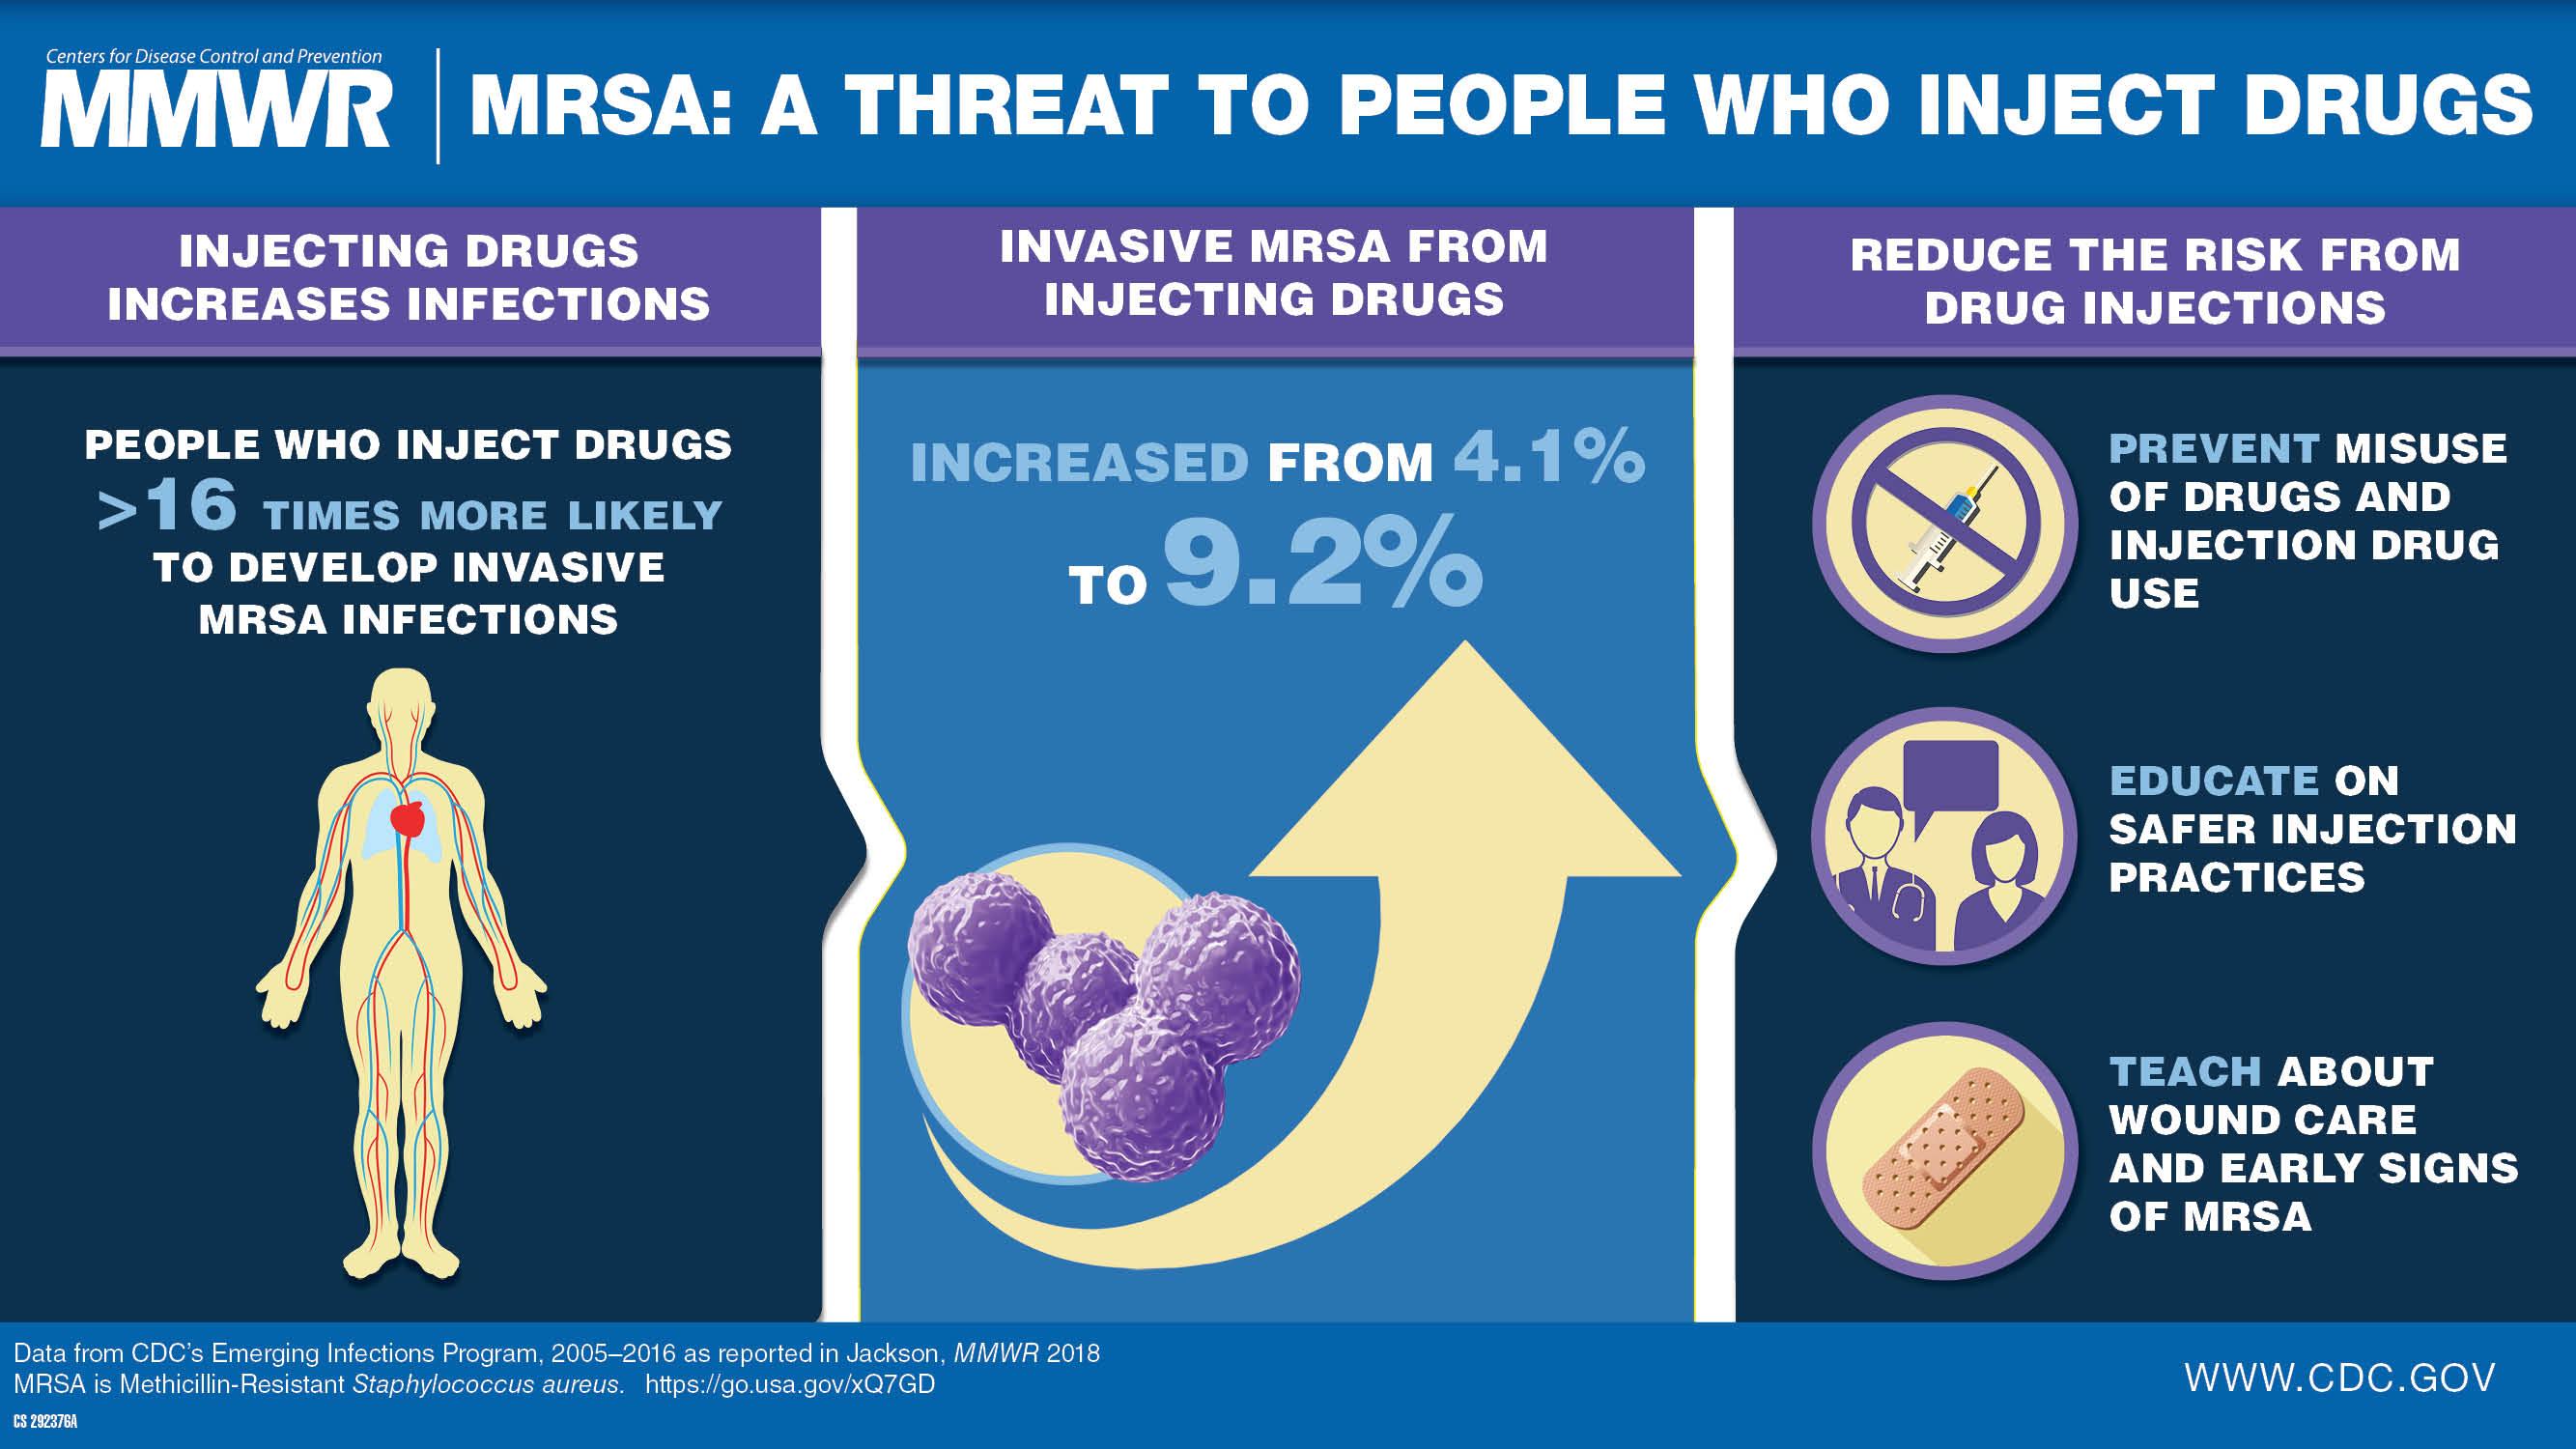 Image of MRSA infographic